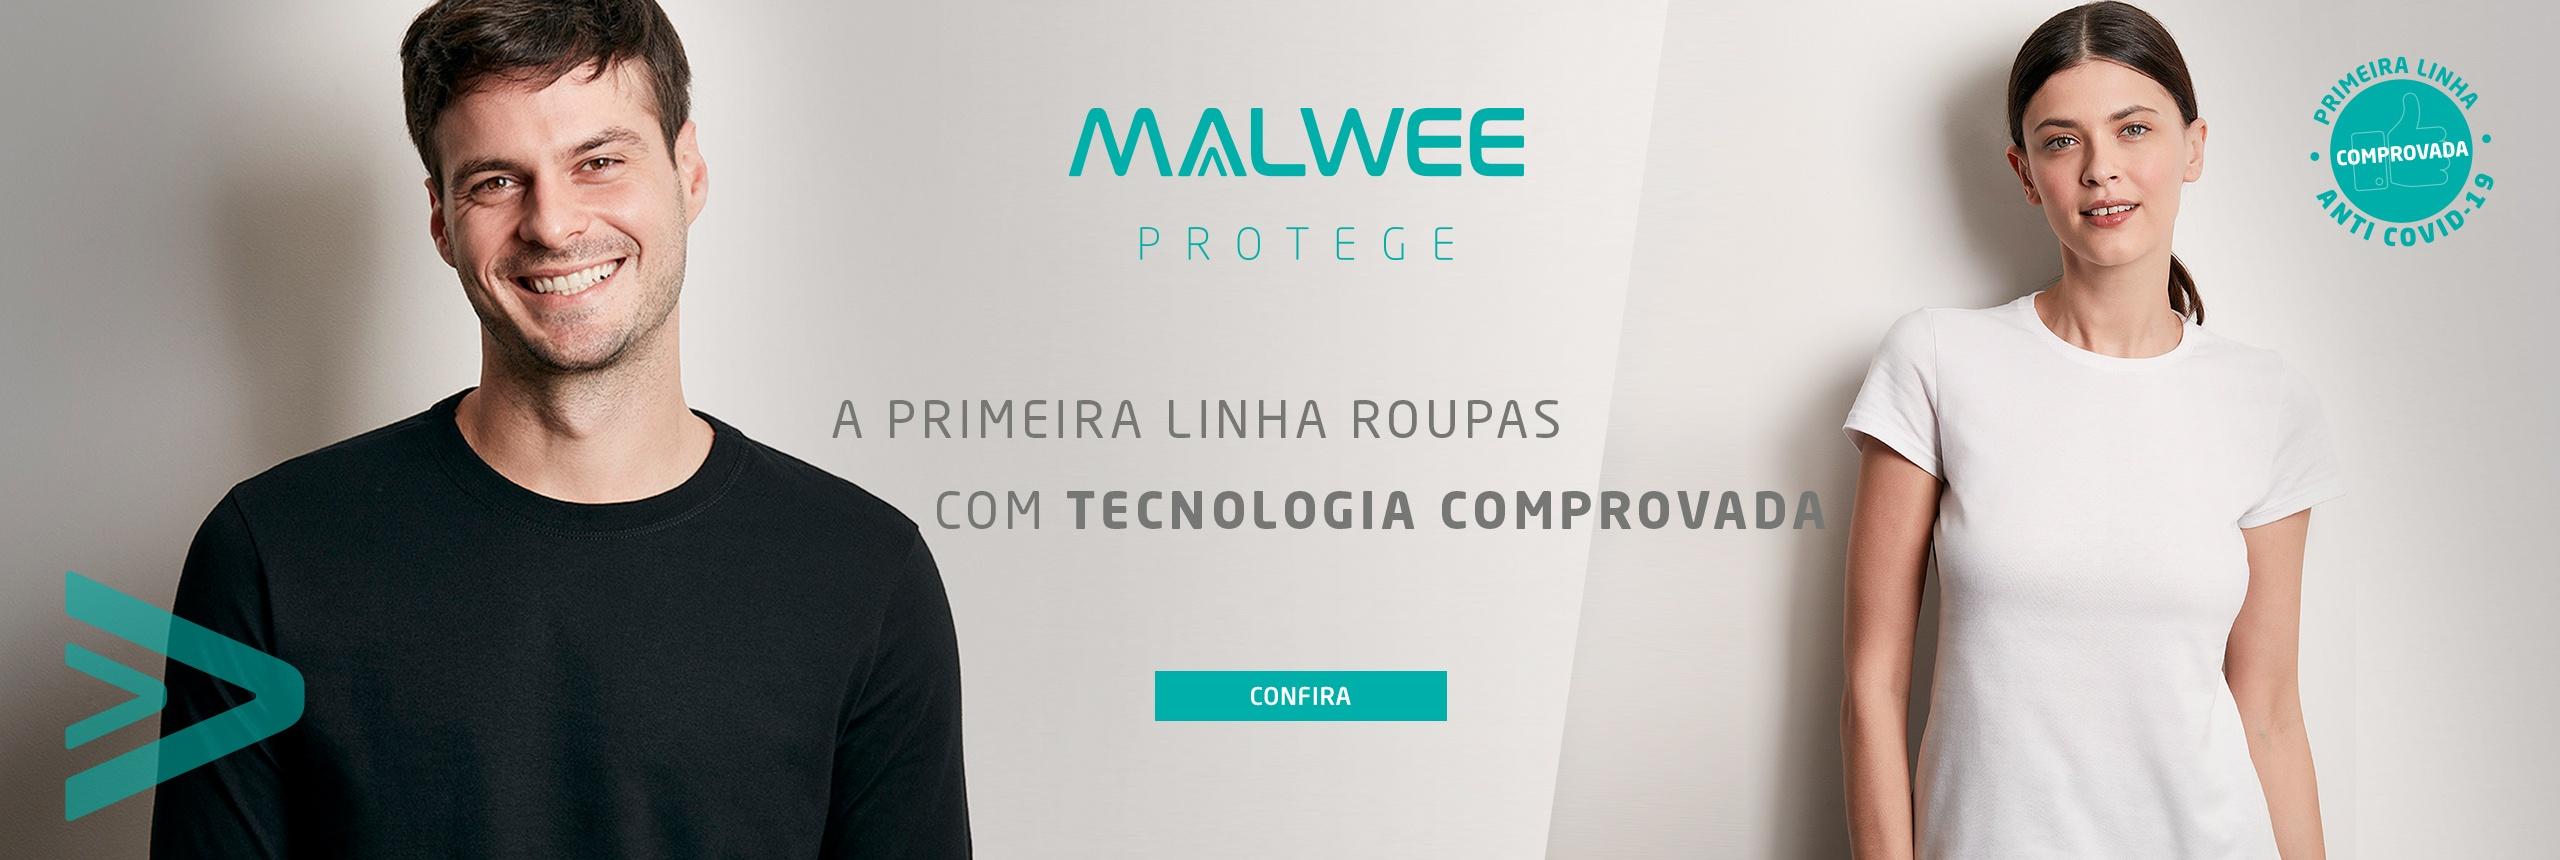 Malwee-protege